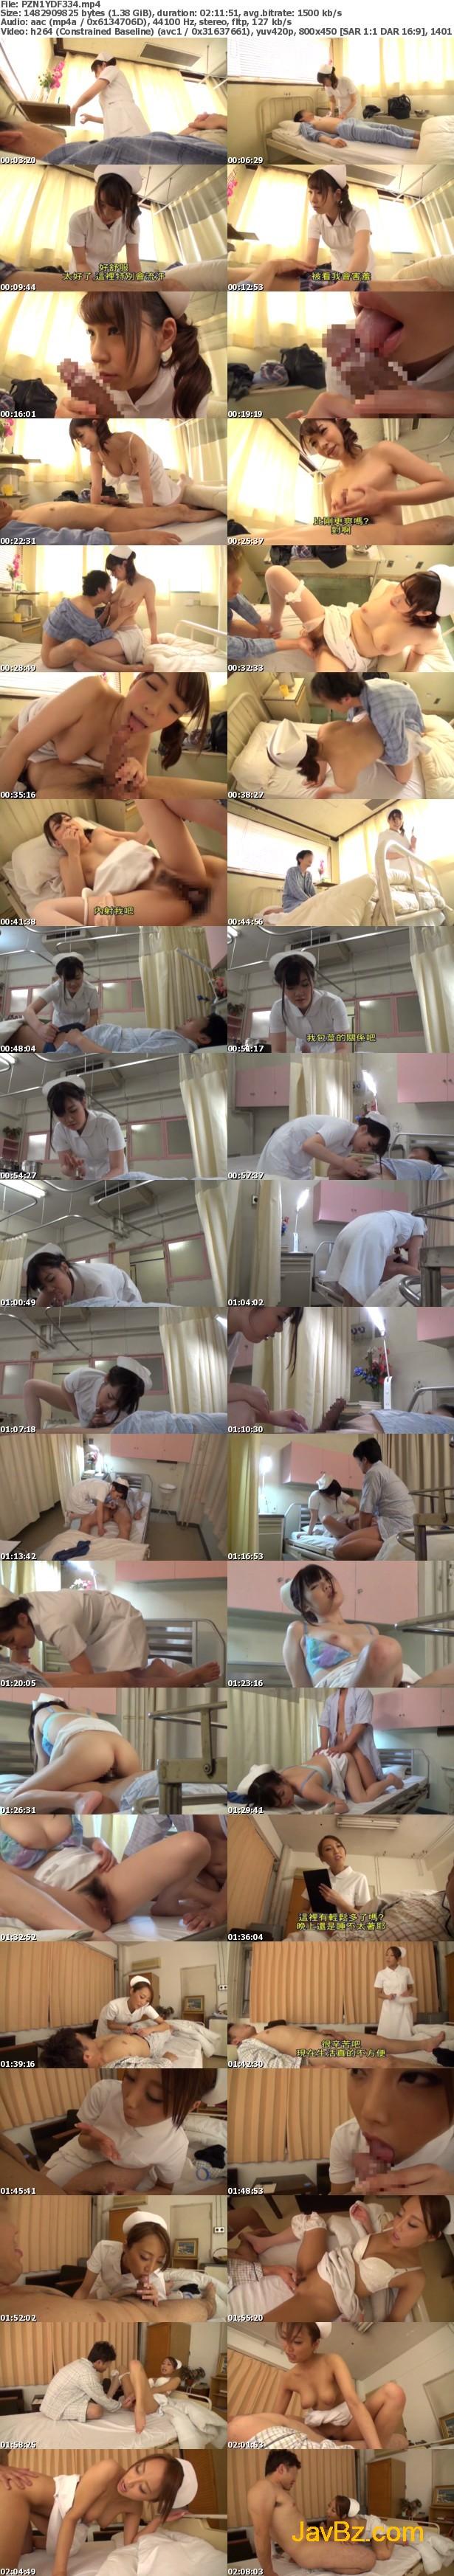 [SCOP-334] 同情包莖溫柔拉開的獻身護士們!不知是因為臭屌味而興奮讓她們小穴全濕,居然還幫臭屌口交!!接著發情的護士被襲擊,還難以抵檔被拉下的龜頭快感,最後就直接中出!![中文字幕]